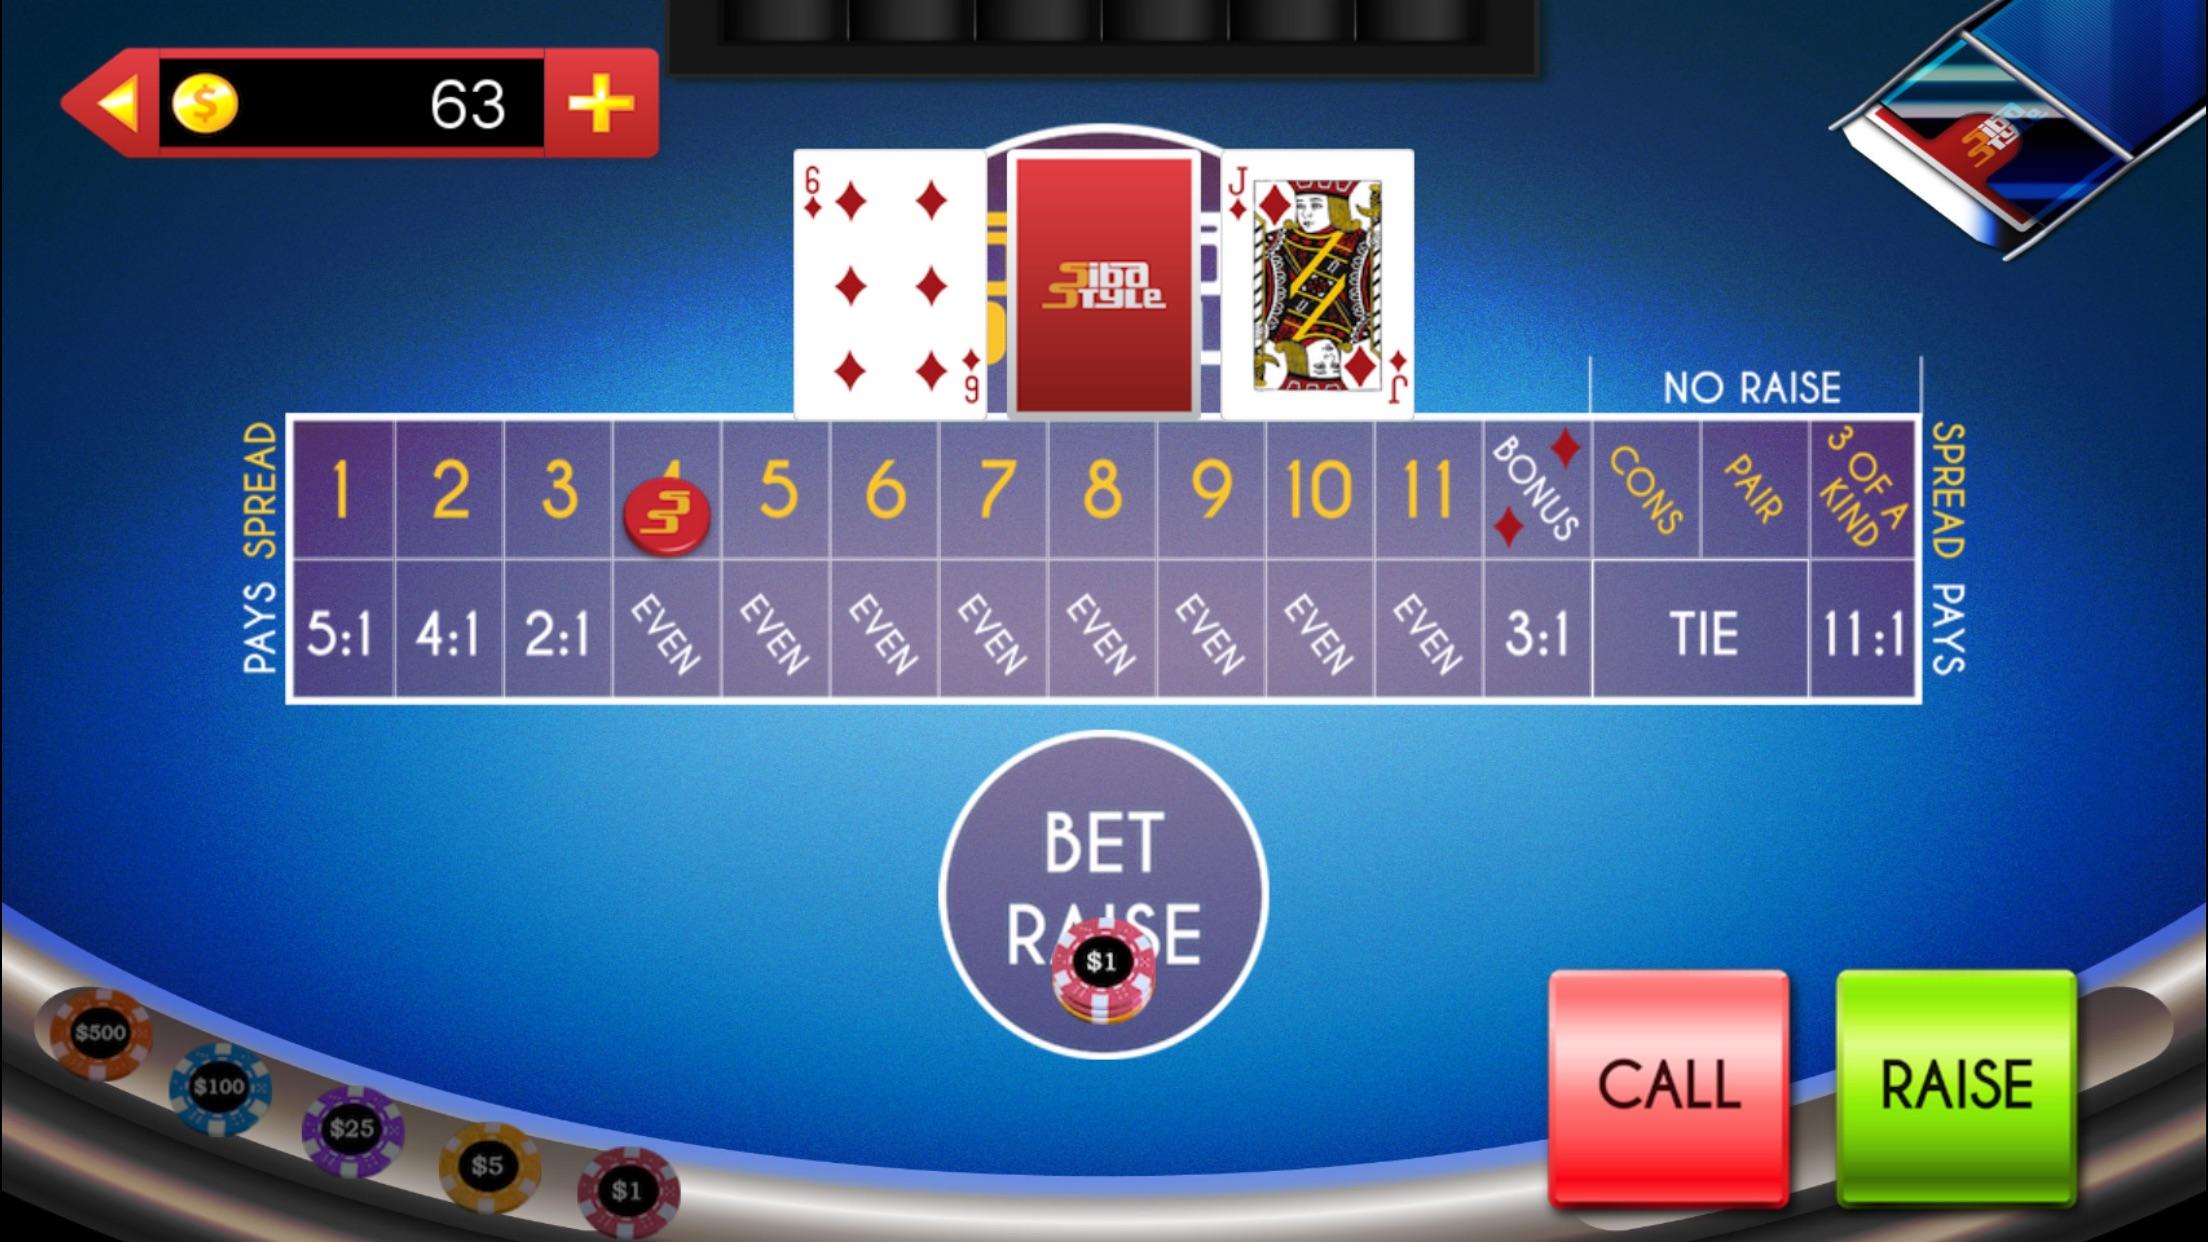 Casino Games: Let It Ride On, 3 Card Poker & More Screenshot